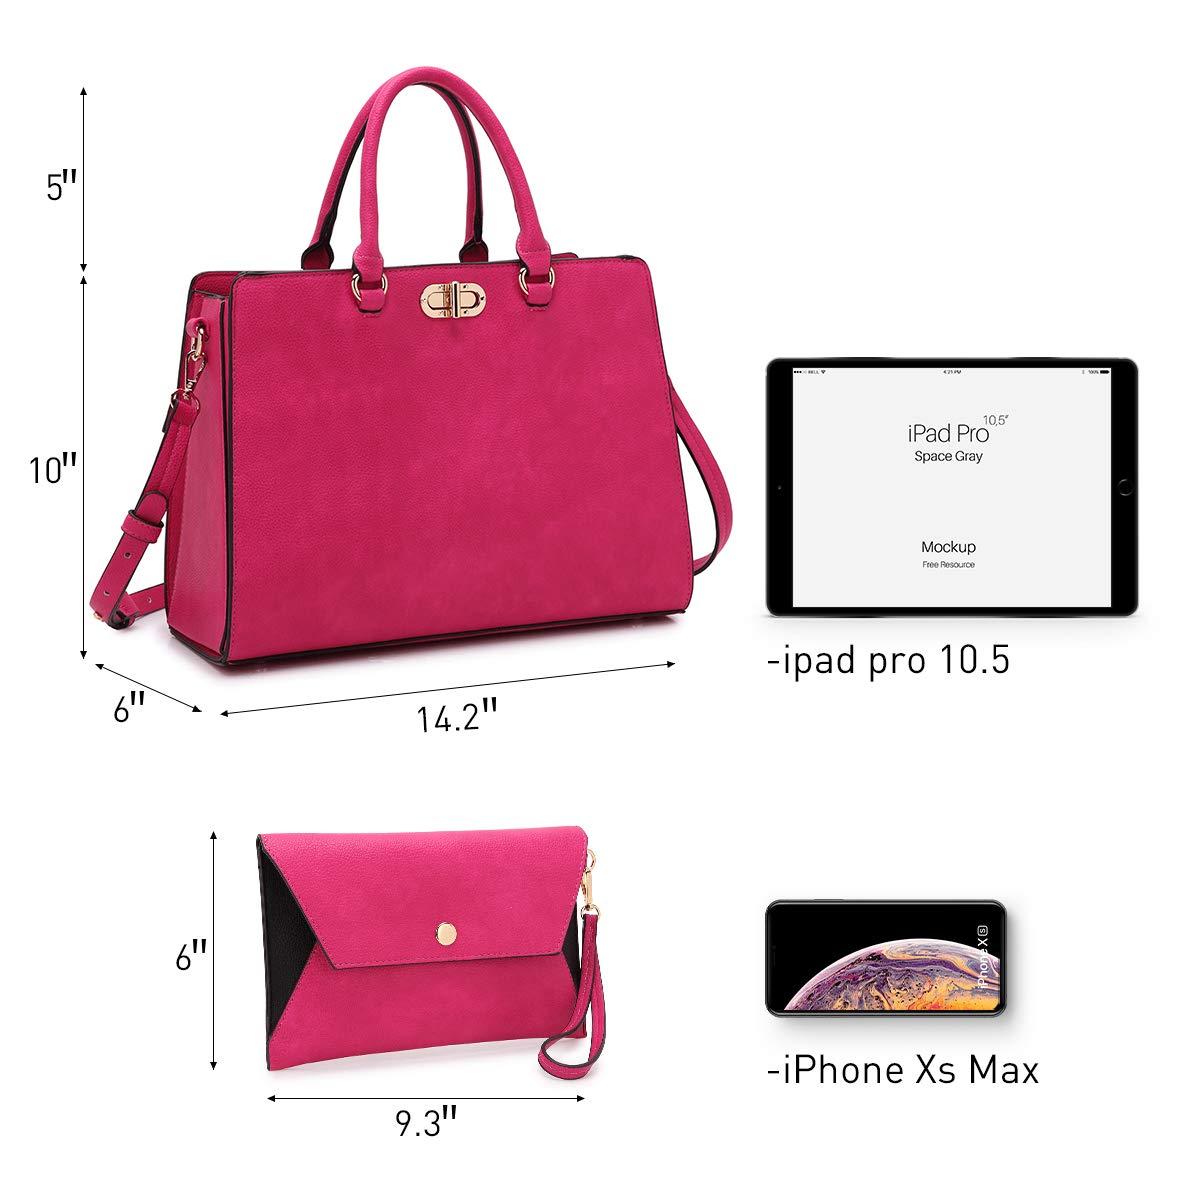 Women's Fashion Handbags Tote Purses Shoulder Bags Top Handle Satchel Purse Set 2pcs 01- Fuchsia by Dasein (Image #2)